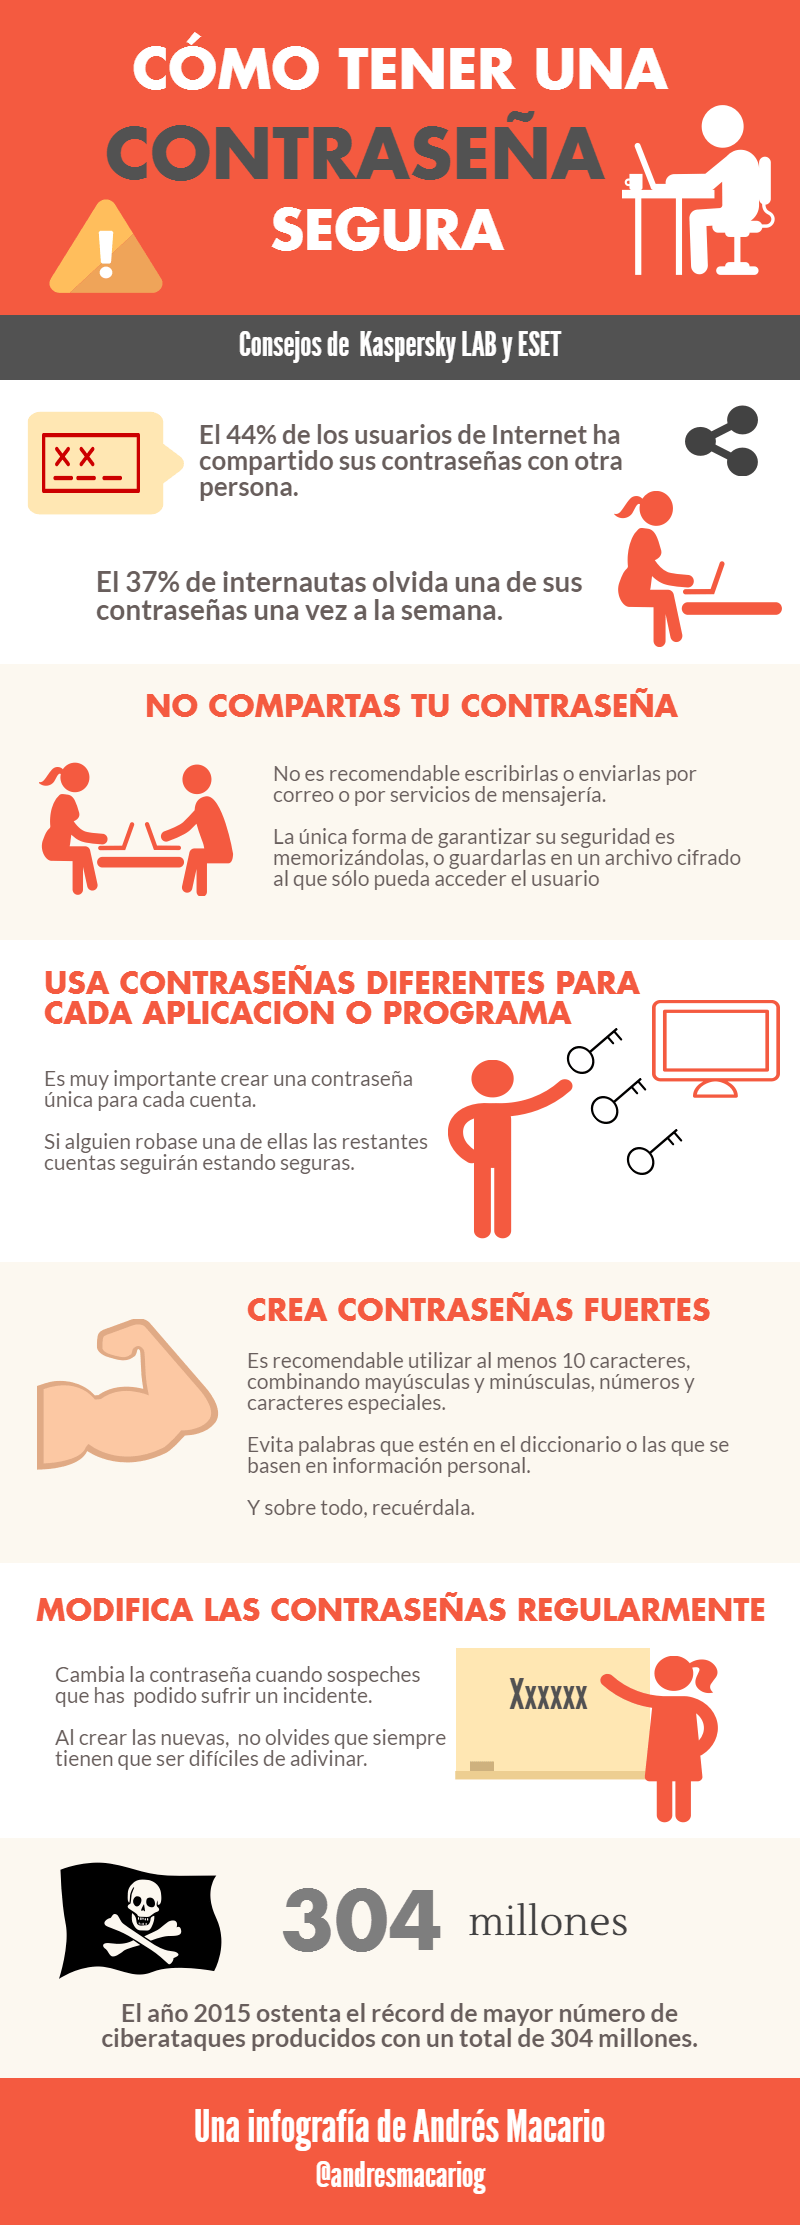 Como tener una contraseña segura- Infografia Andres Macario